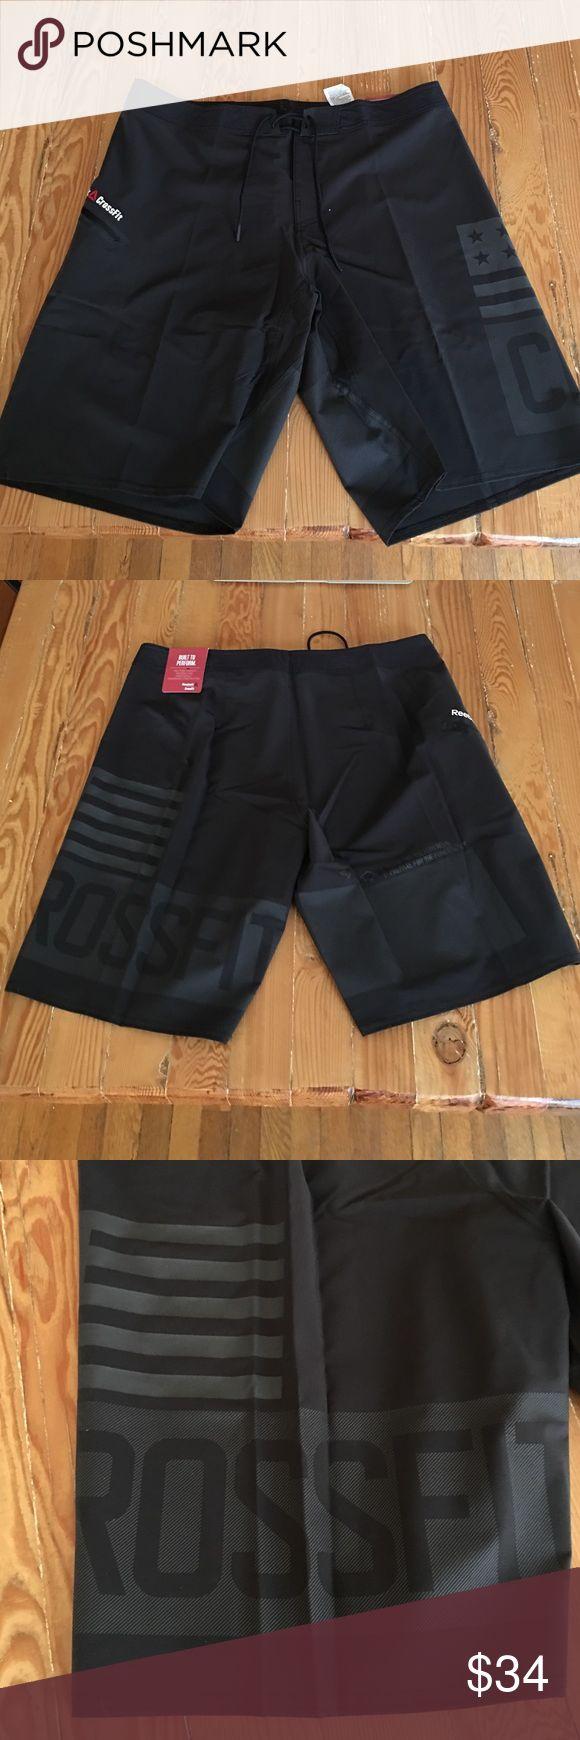 Men's Reebok CrossFit Super Nasty Hero Short Black Reebok men's shorts. New with tags! Reebok Shorts Athletic